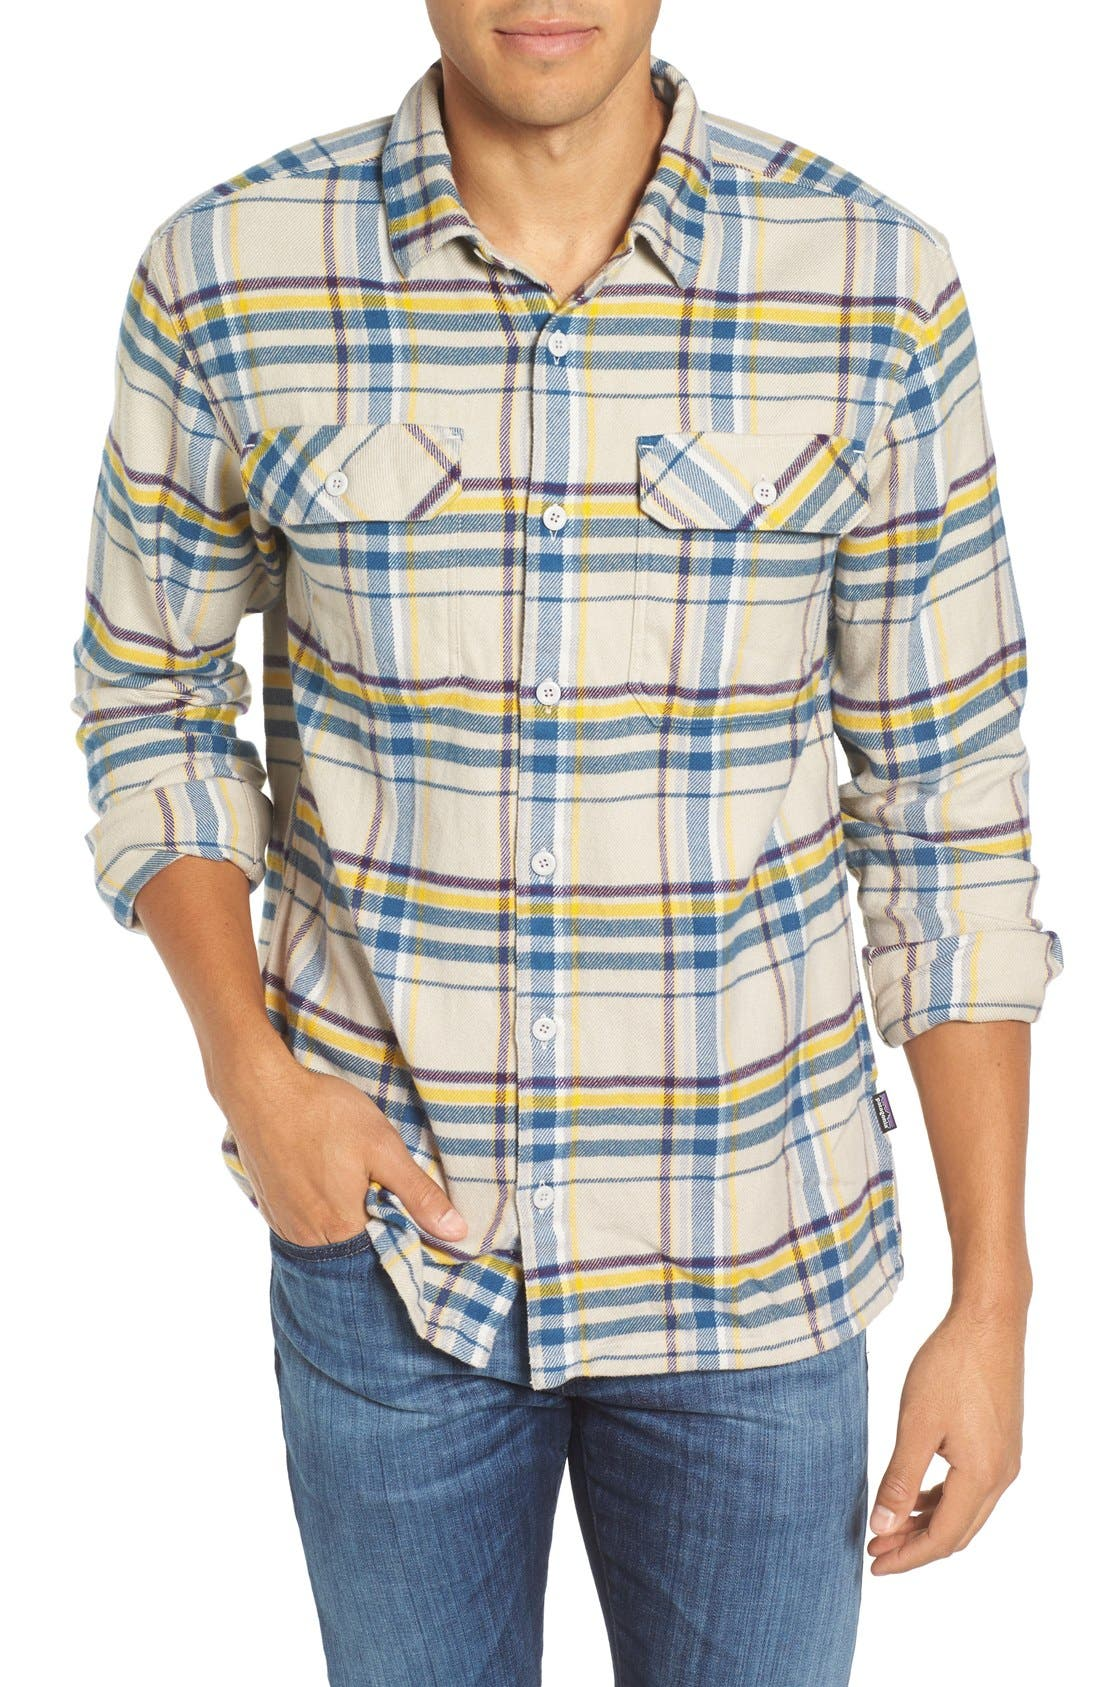 Main Image - Patagonia 'Fjord' Regular Fit Organic Cotton Flannel Shirt